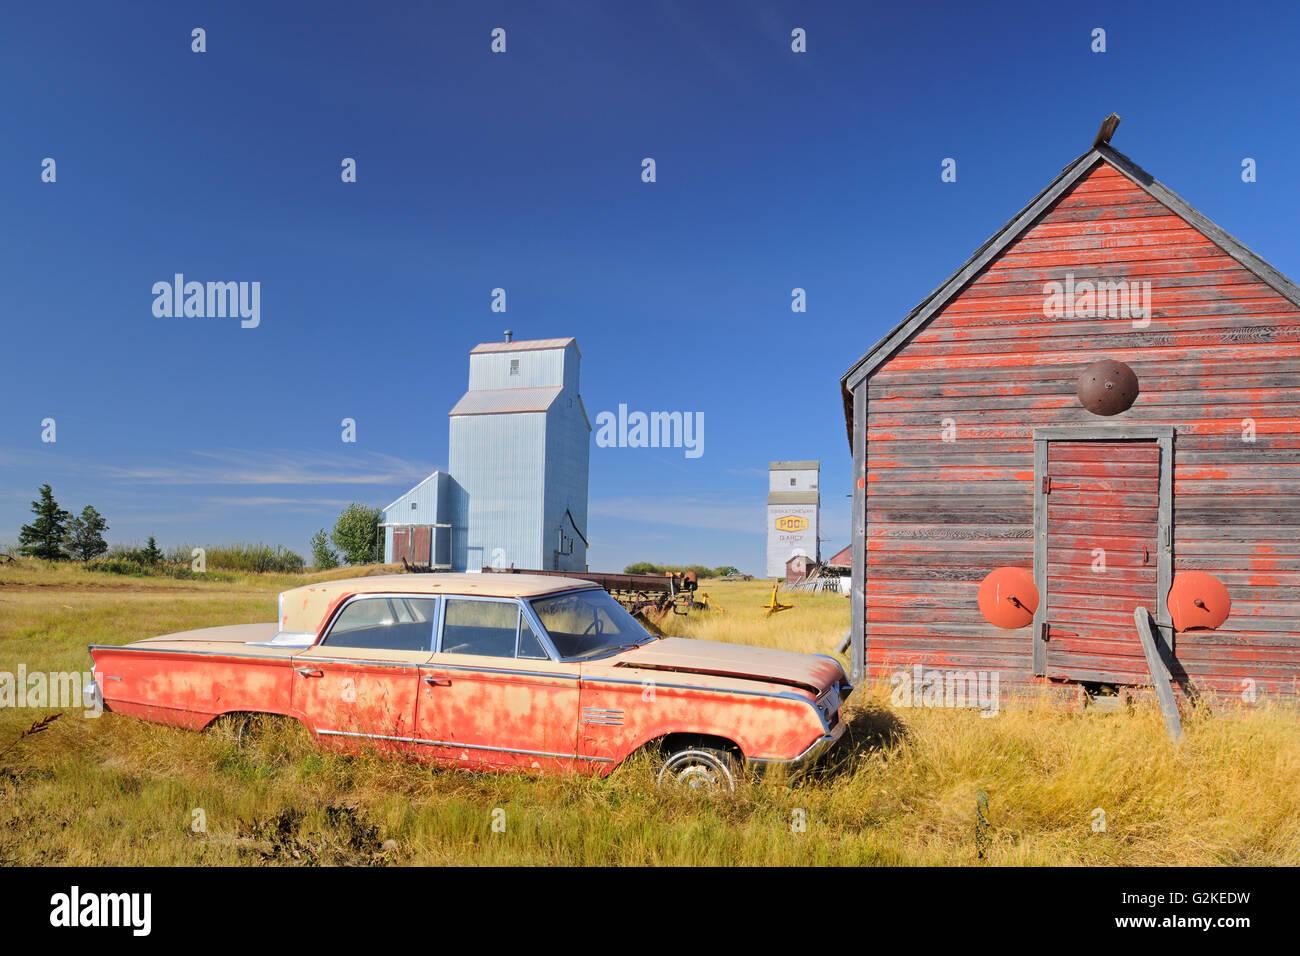 Old car, grain elevator and sheds Darcy Saskatchewan Canada - Stock Image